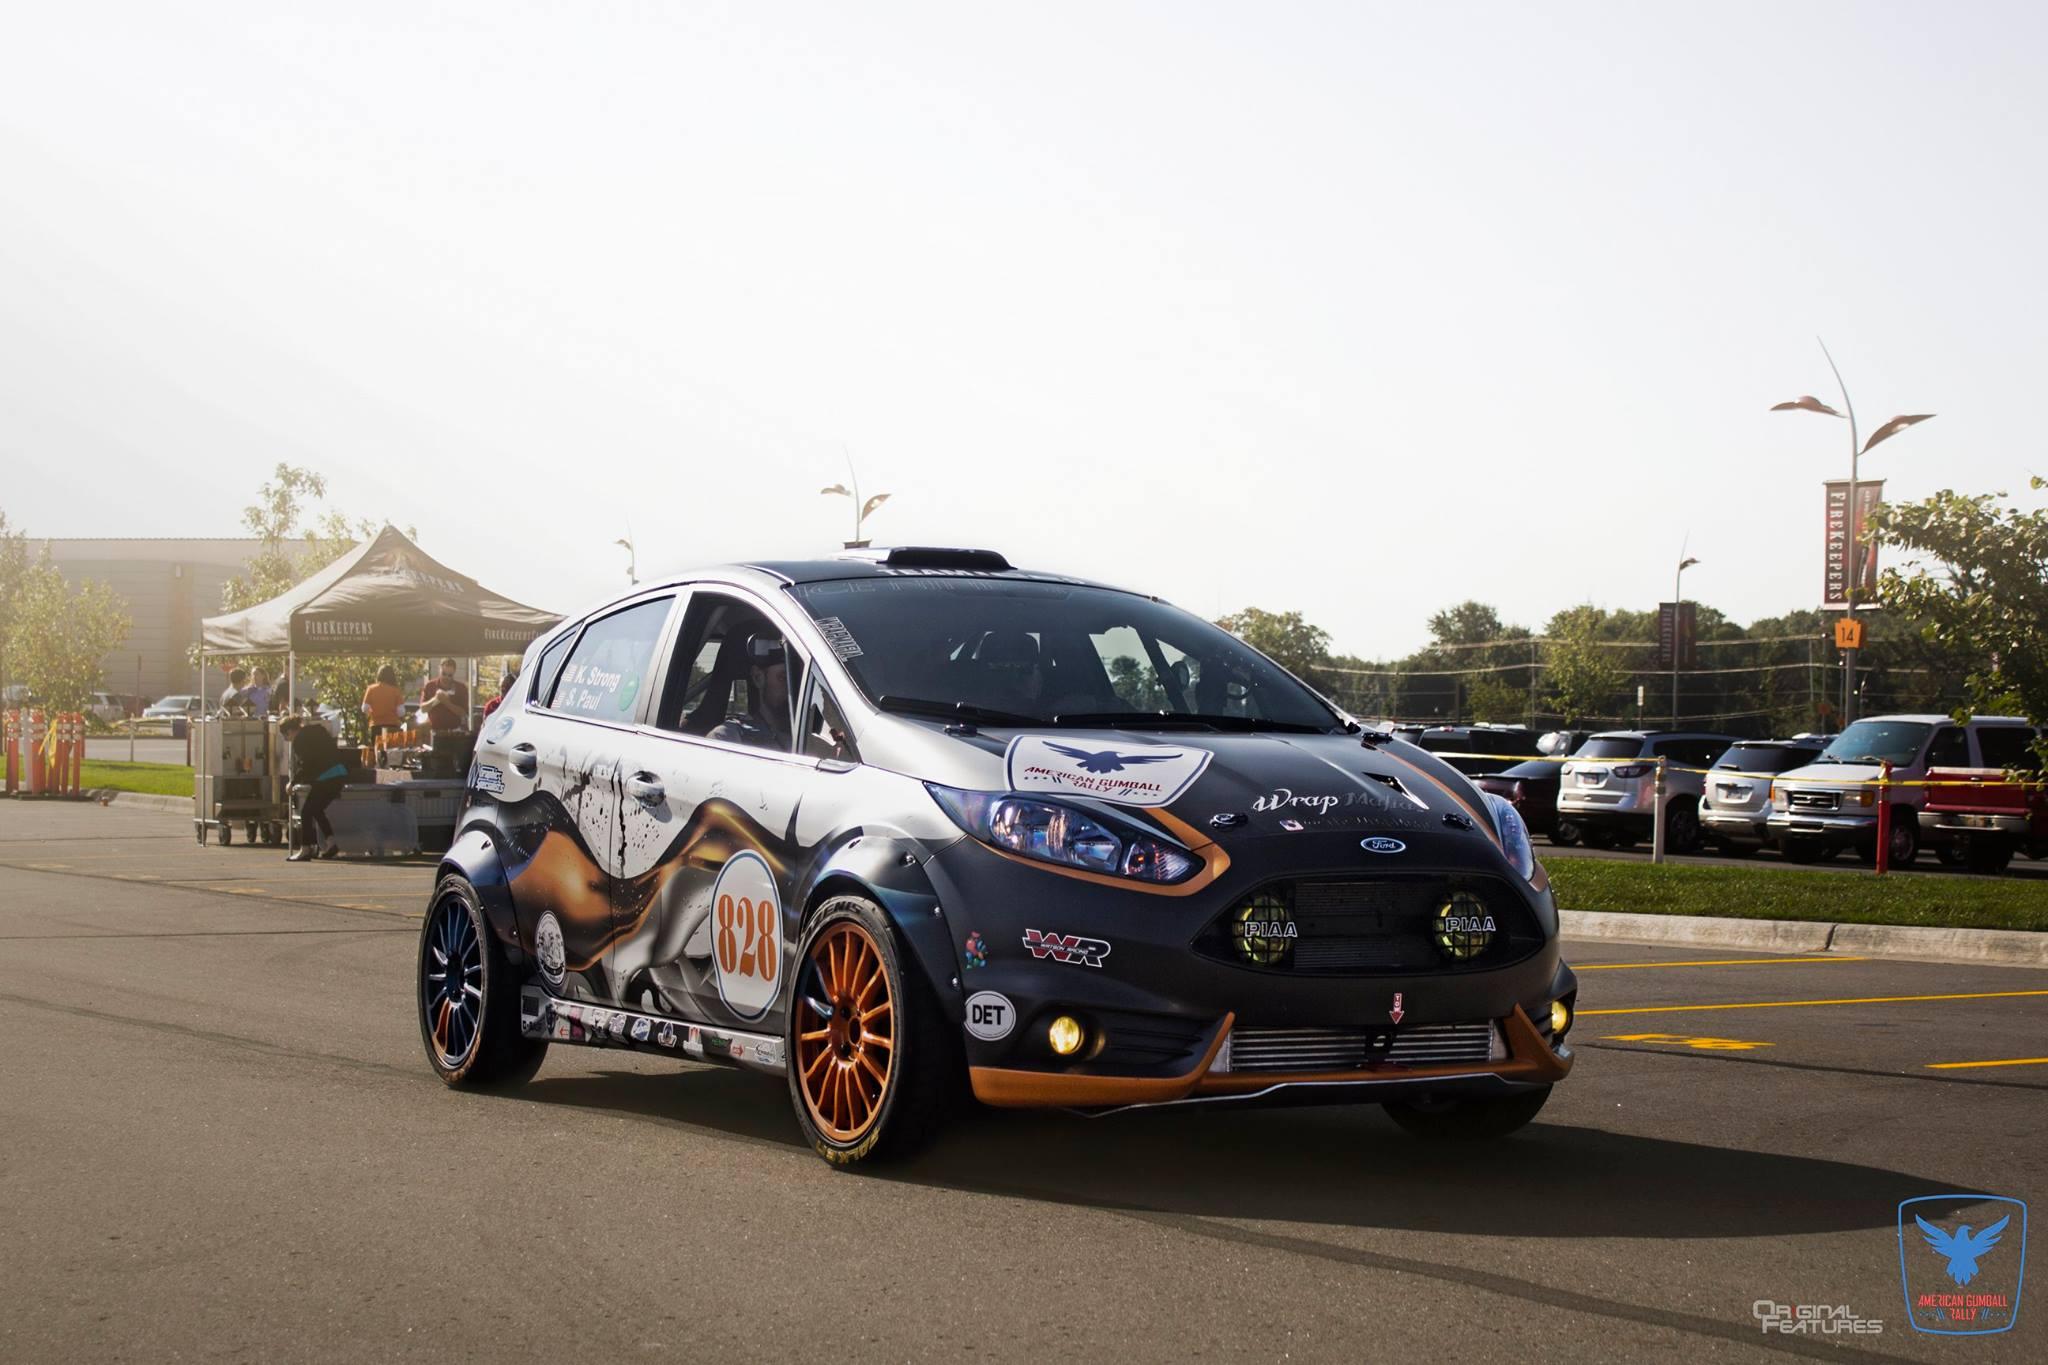 Michigan Gumball Rally Part 1